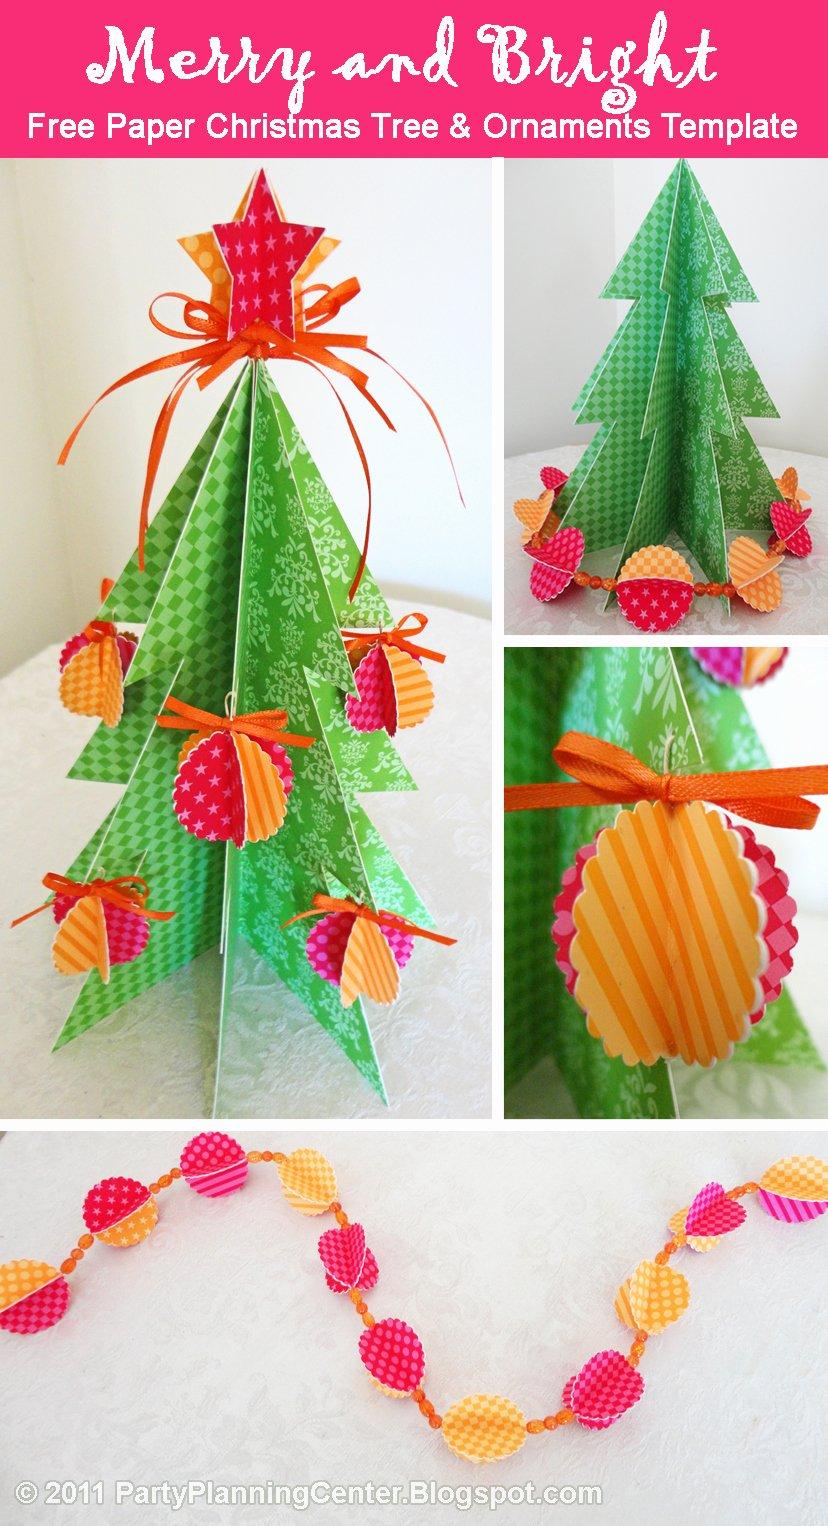 Christmas Paper to Print Inspirational 25 Handmade Christmas Ideas the 36th Avenue